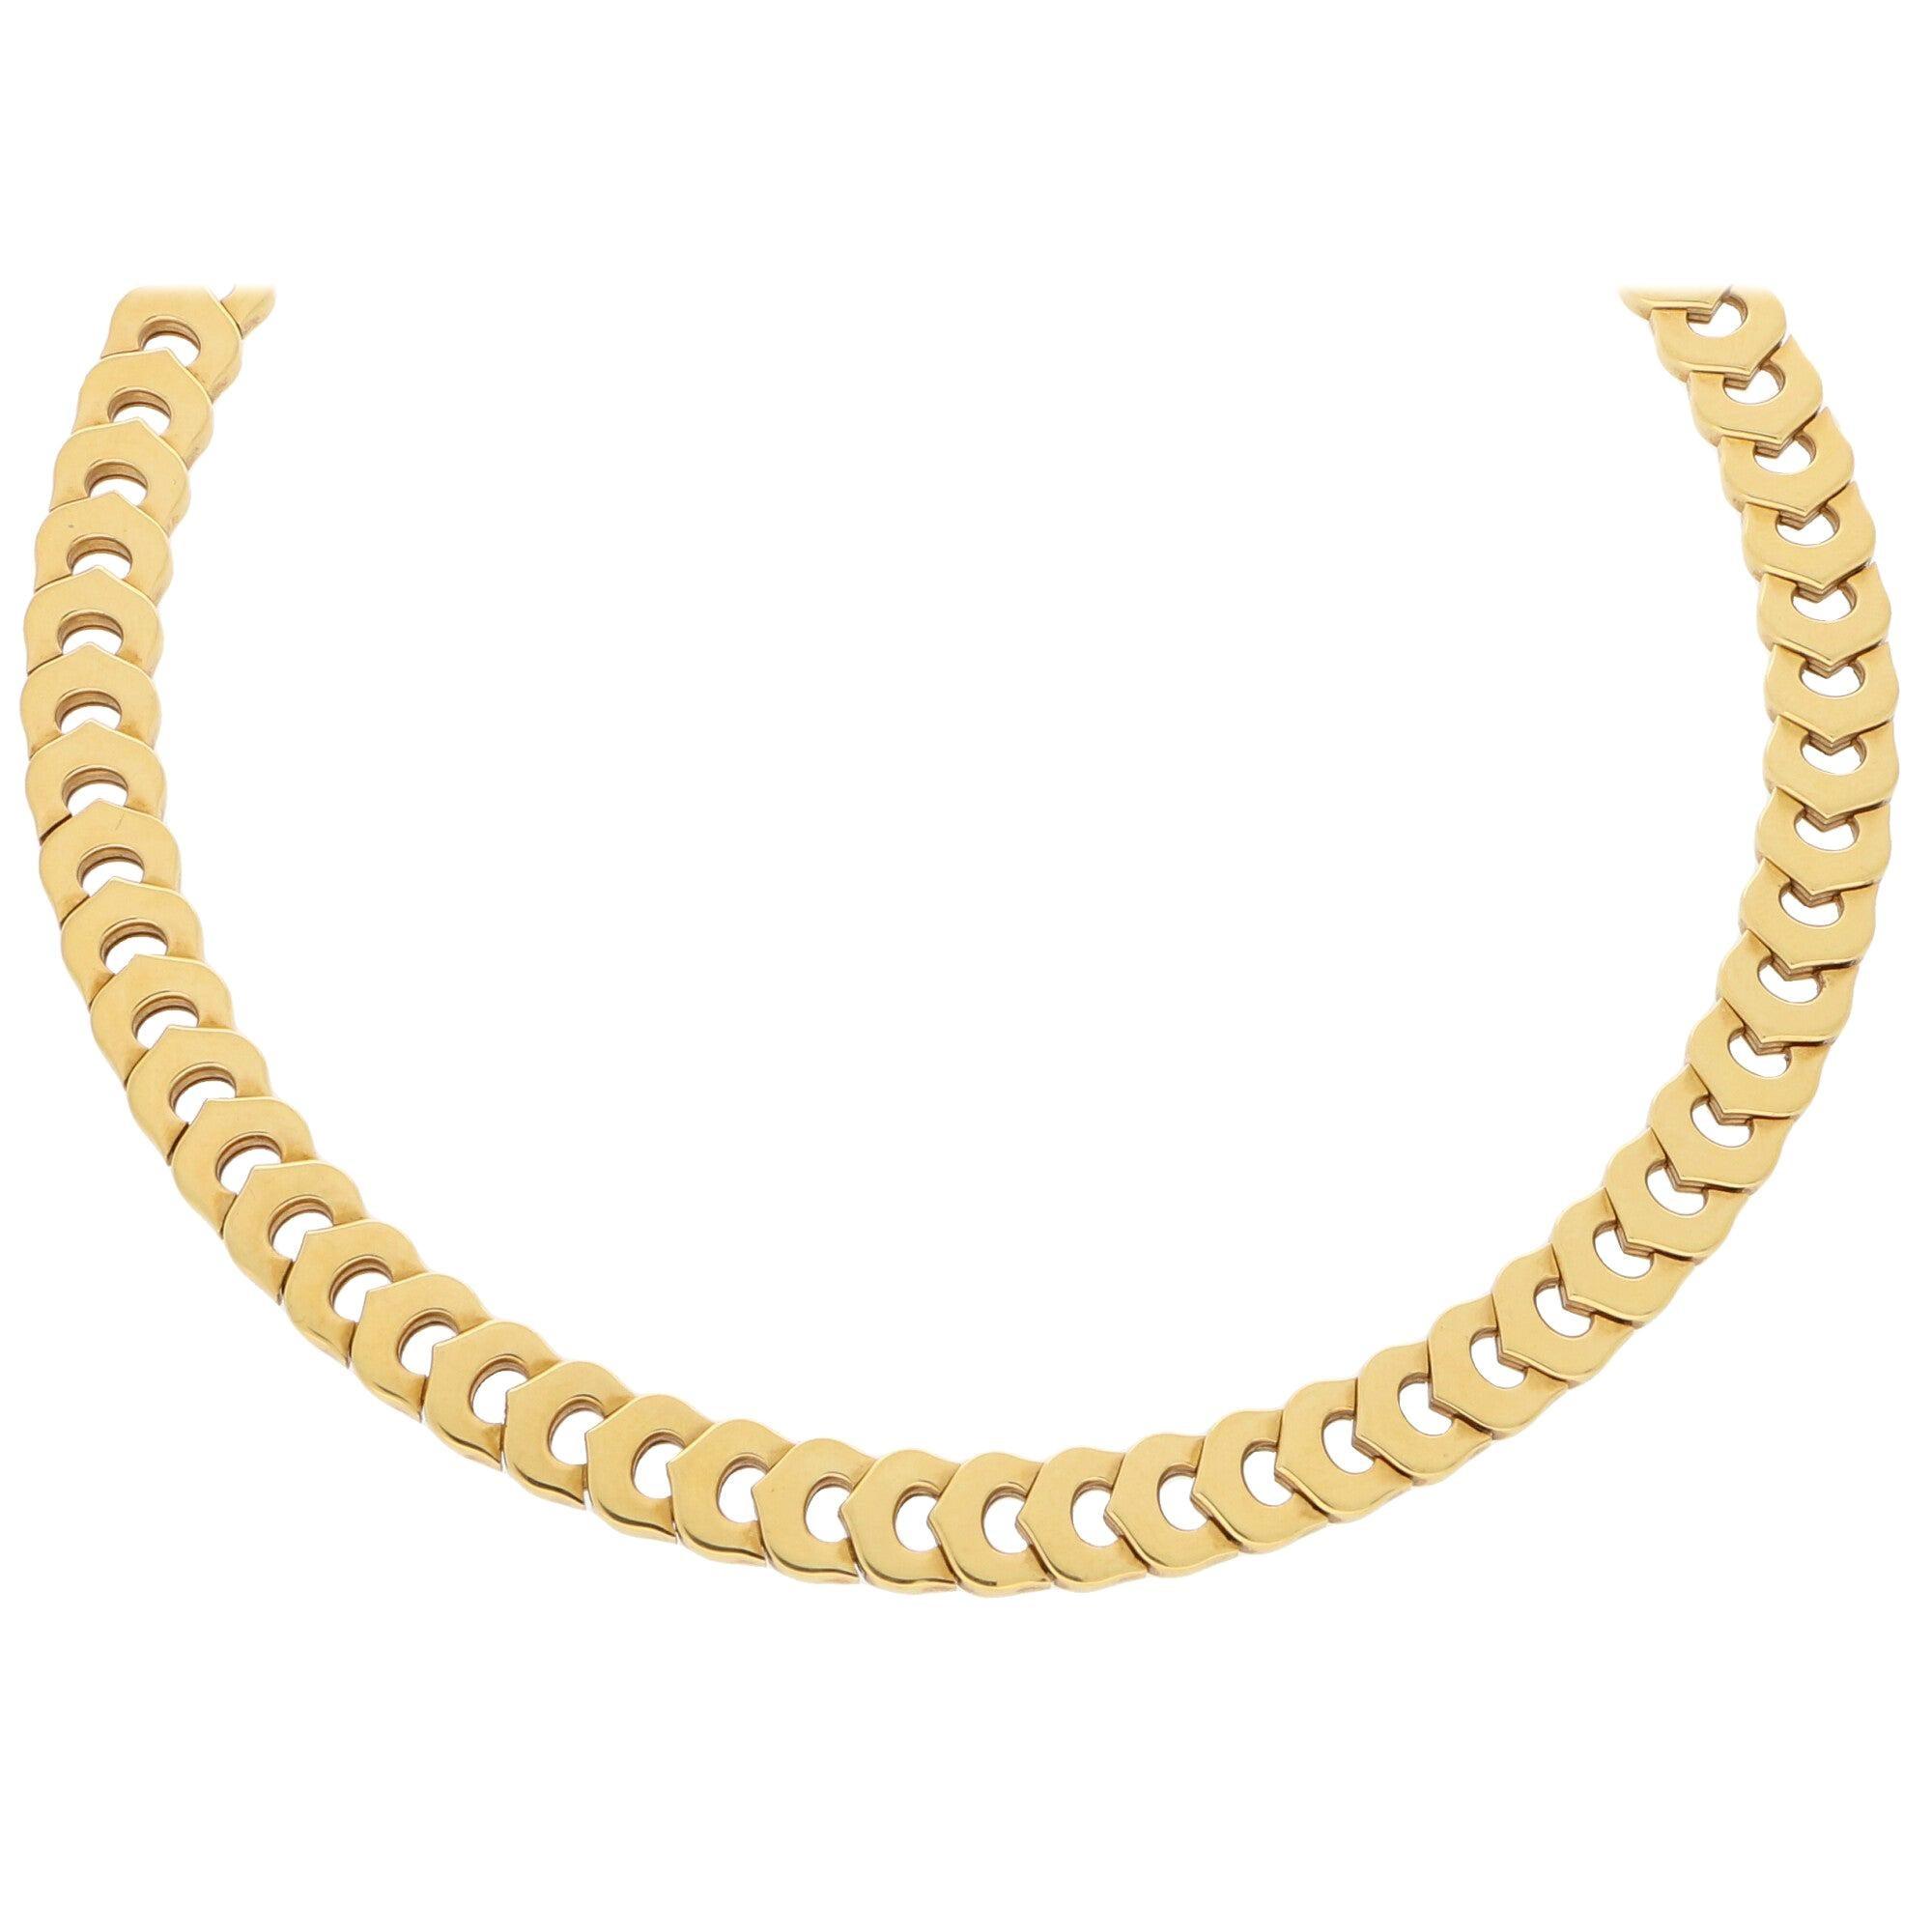 Cartier C de Cartier Necklace Set in Solid 18 Karat Yellow Gold